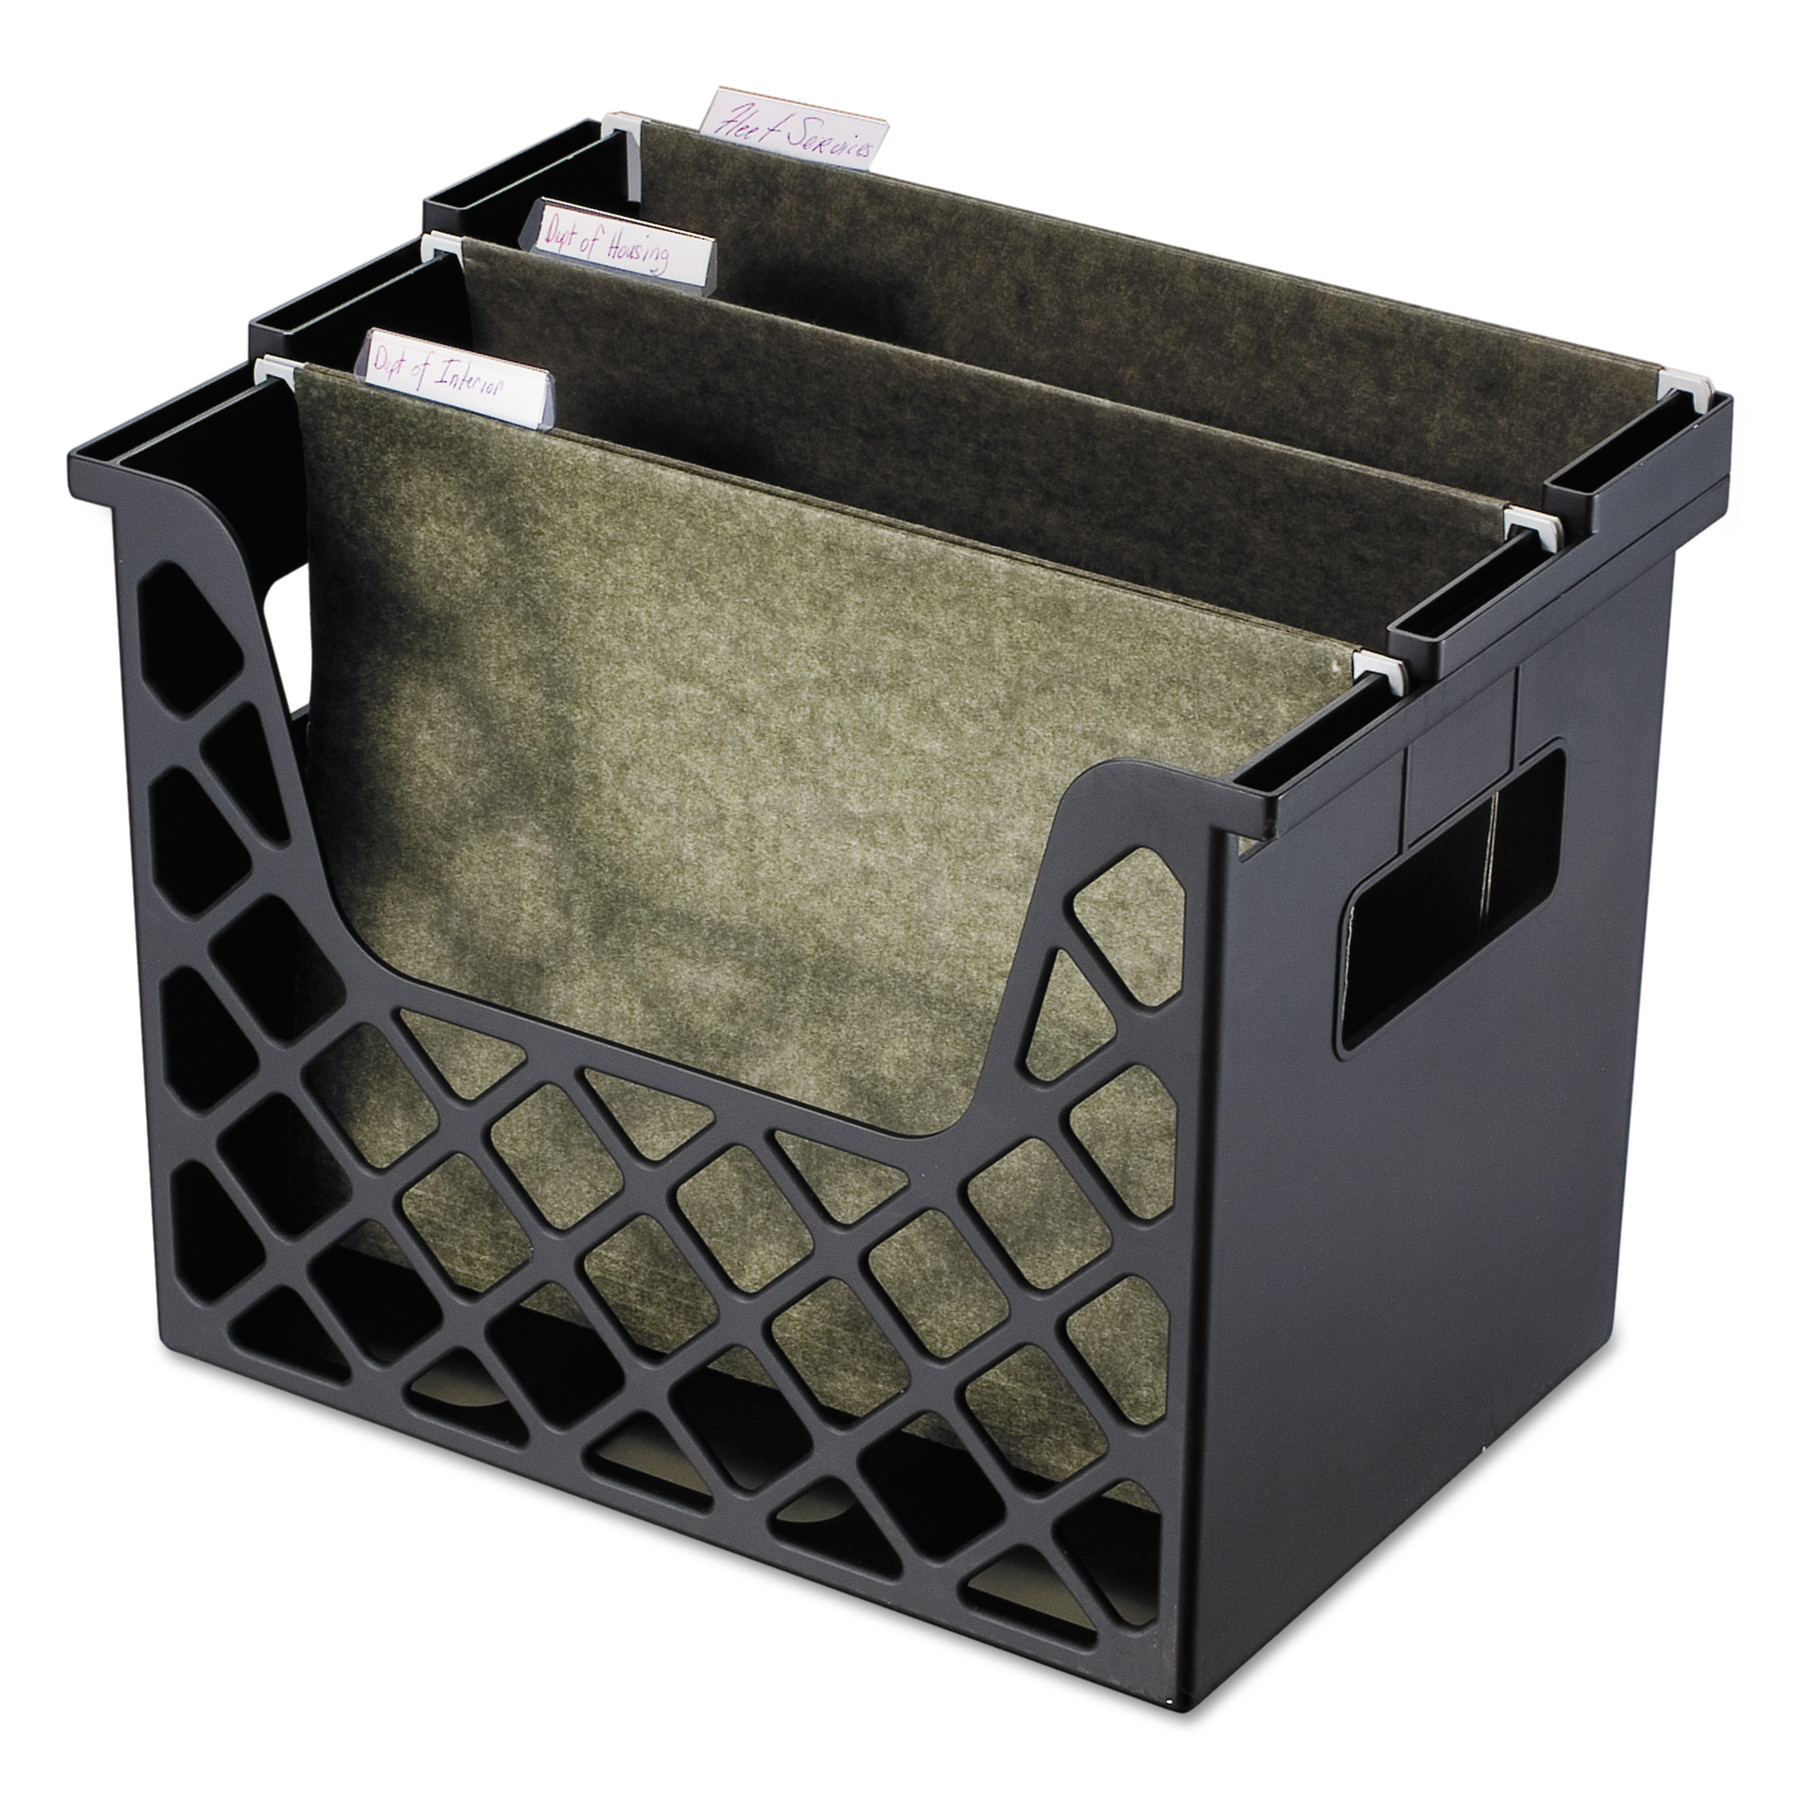 Universal Recycled Desktop File Holder, Plastic, 13 1/4 X 8 1/2 X 9 5/8, Black -UNV08123